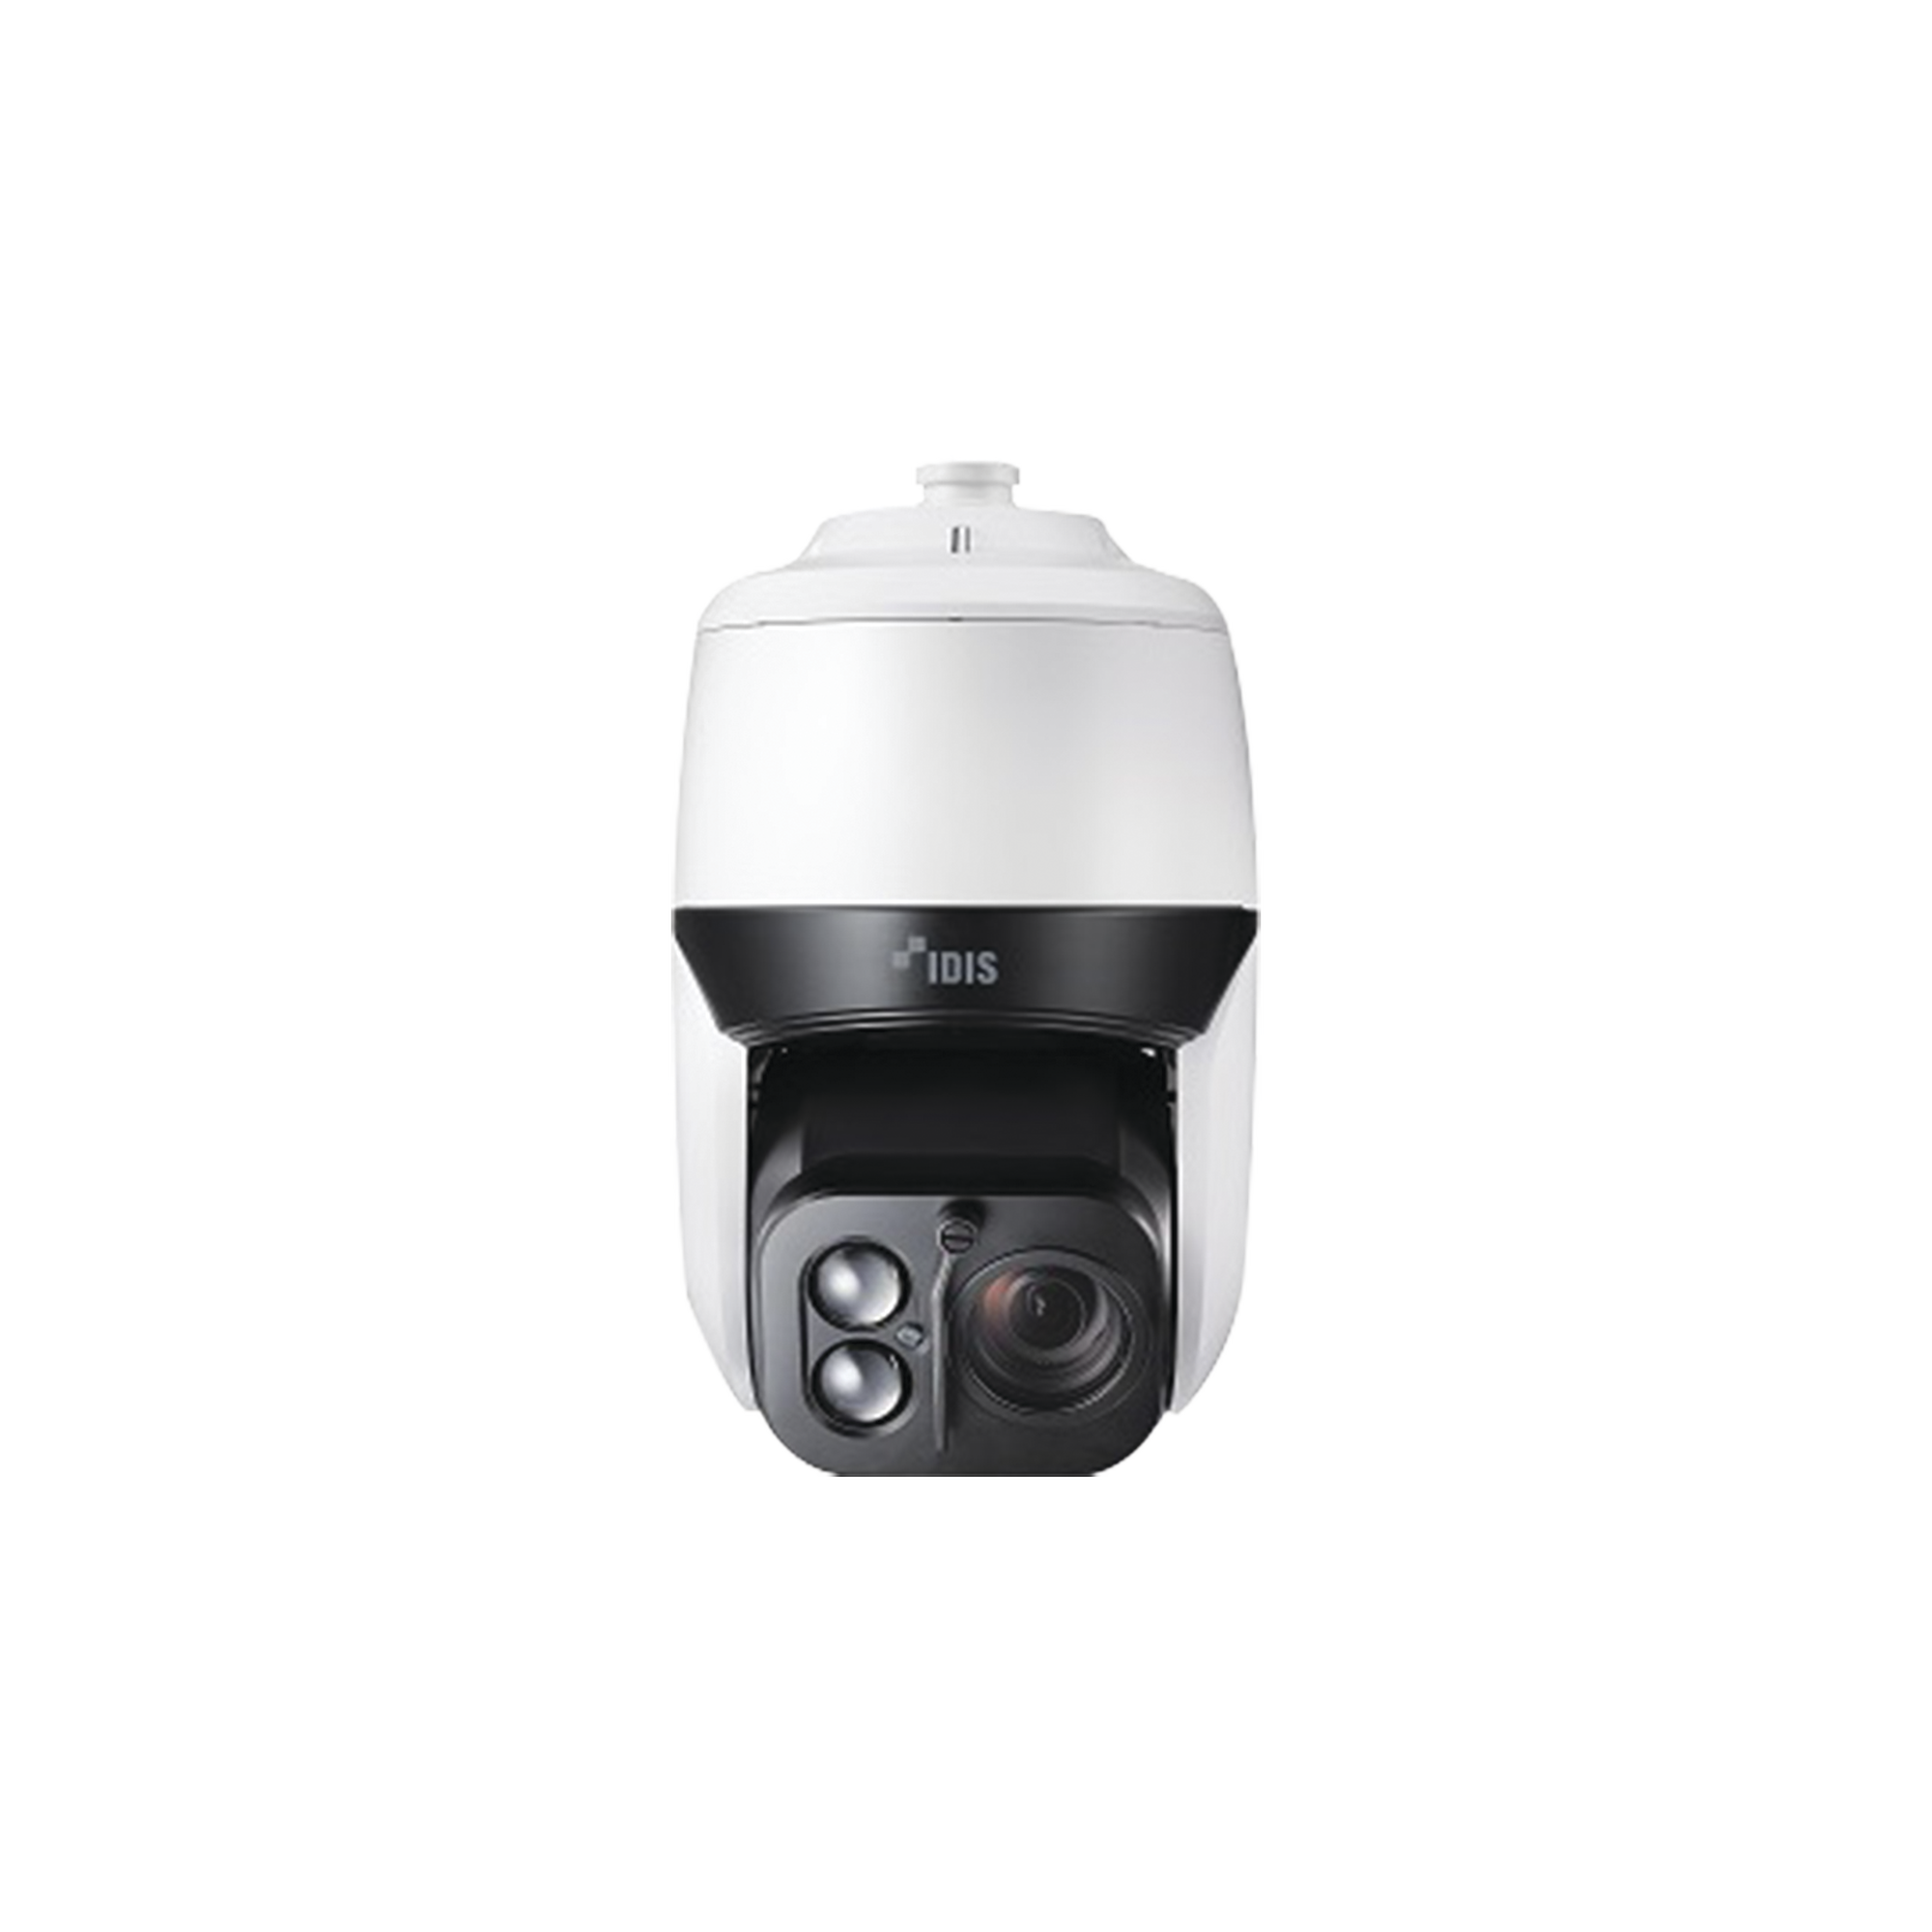 Camara Domo PTZ IP 5MP | 31X de Zoom | 200m IR | Estabilizador de imagen EIS | WDR Real 120 dB | Exterior IP66 | IK10 | DirectIP | Autoseguimiento